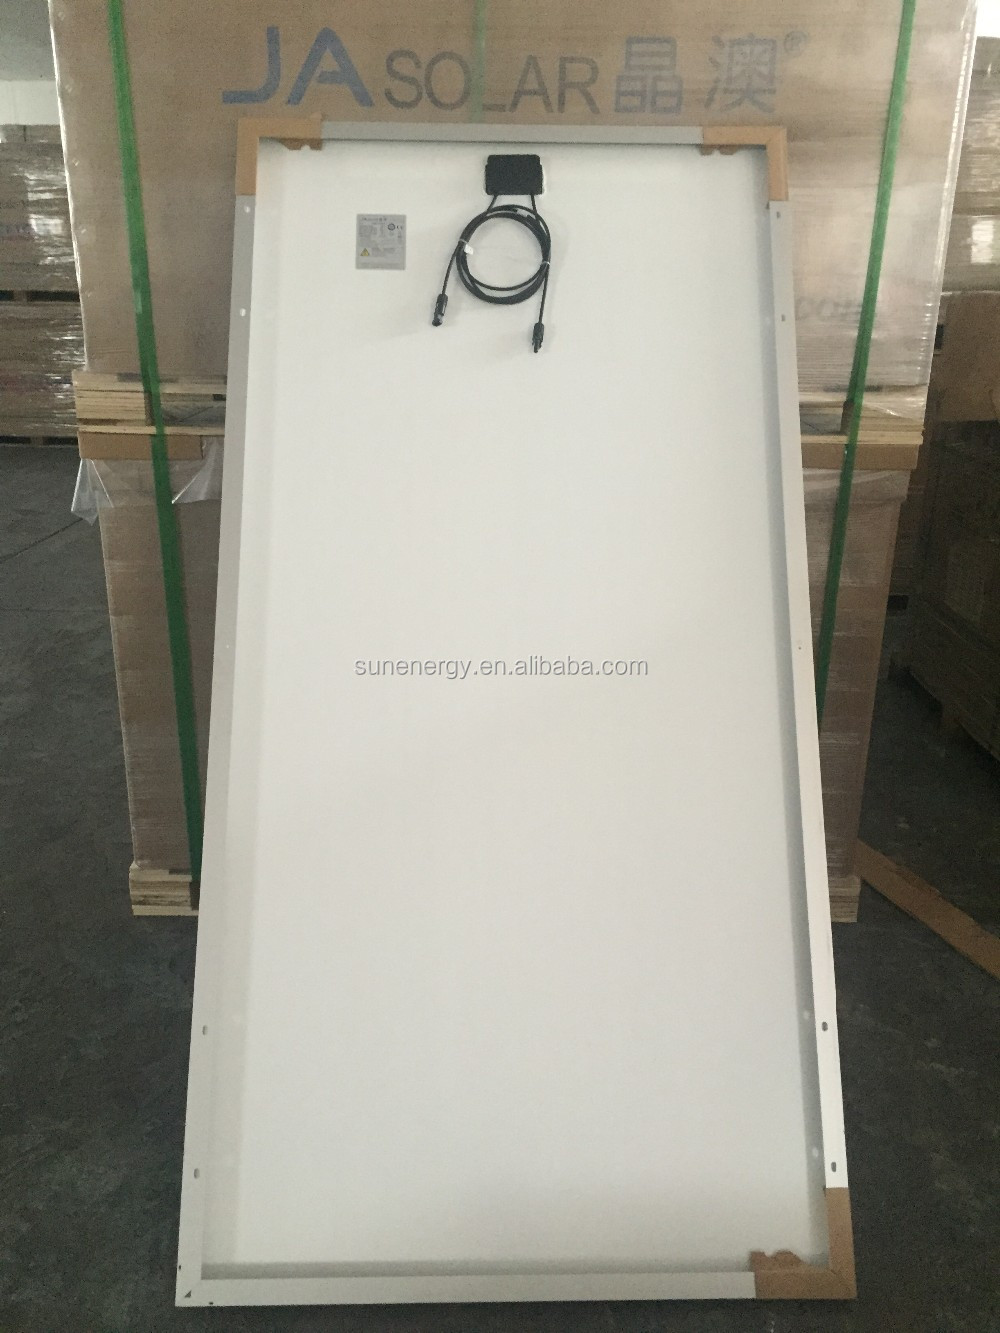 Ja Solar 350w Solar Panel By 100 El Double Inspection